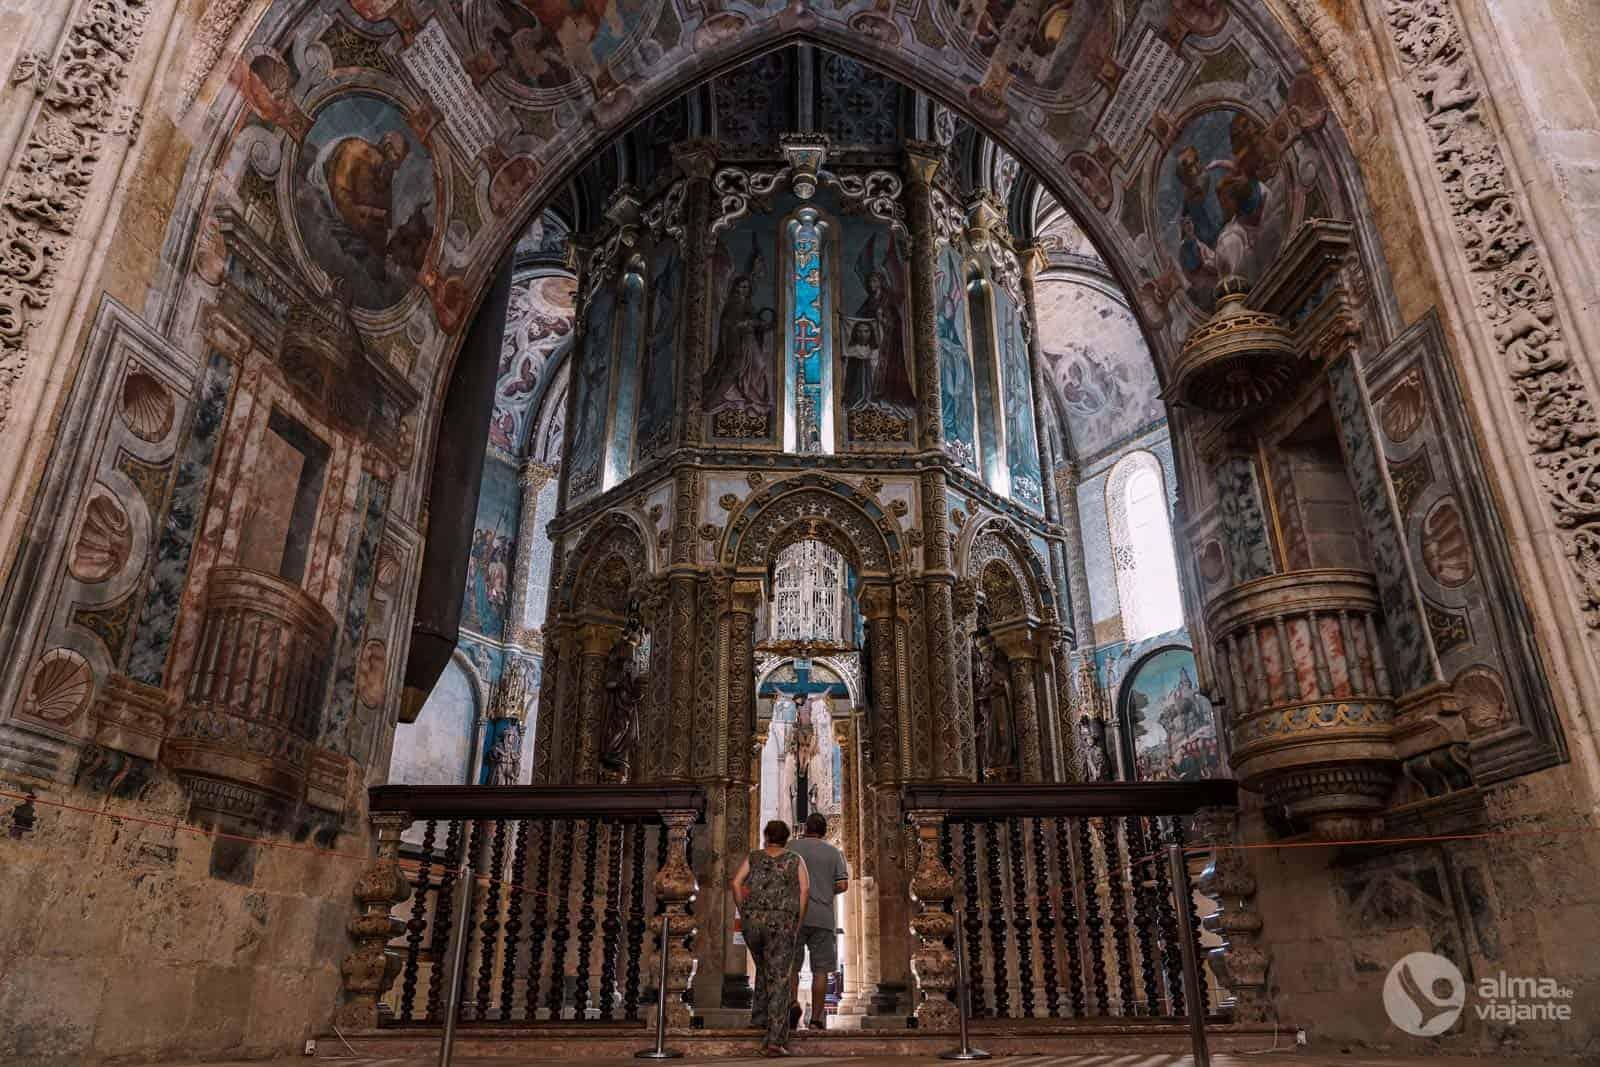 Charola do Convento de Cristo, Tomar, Centro de Portugal